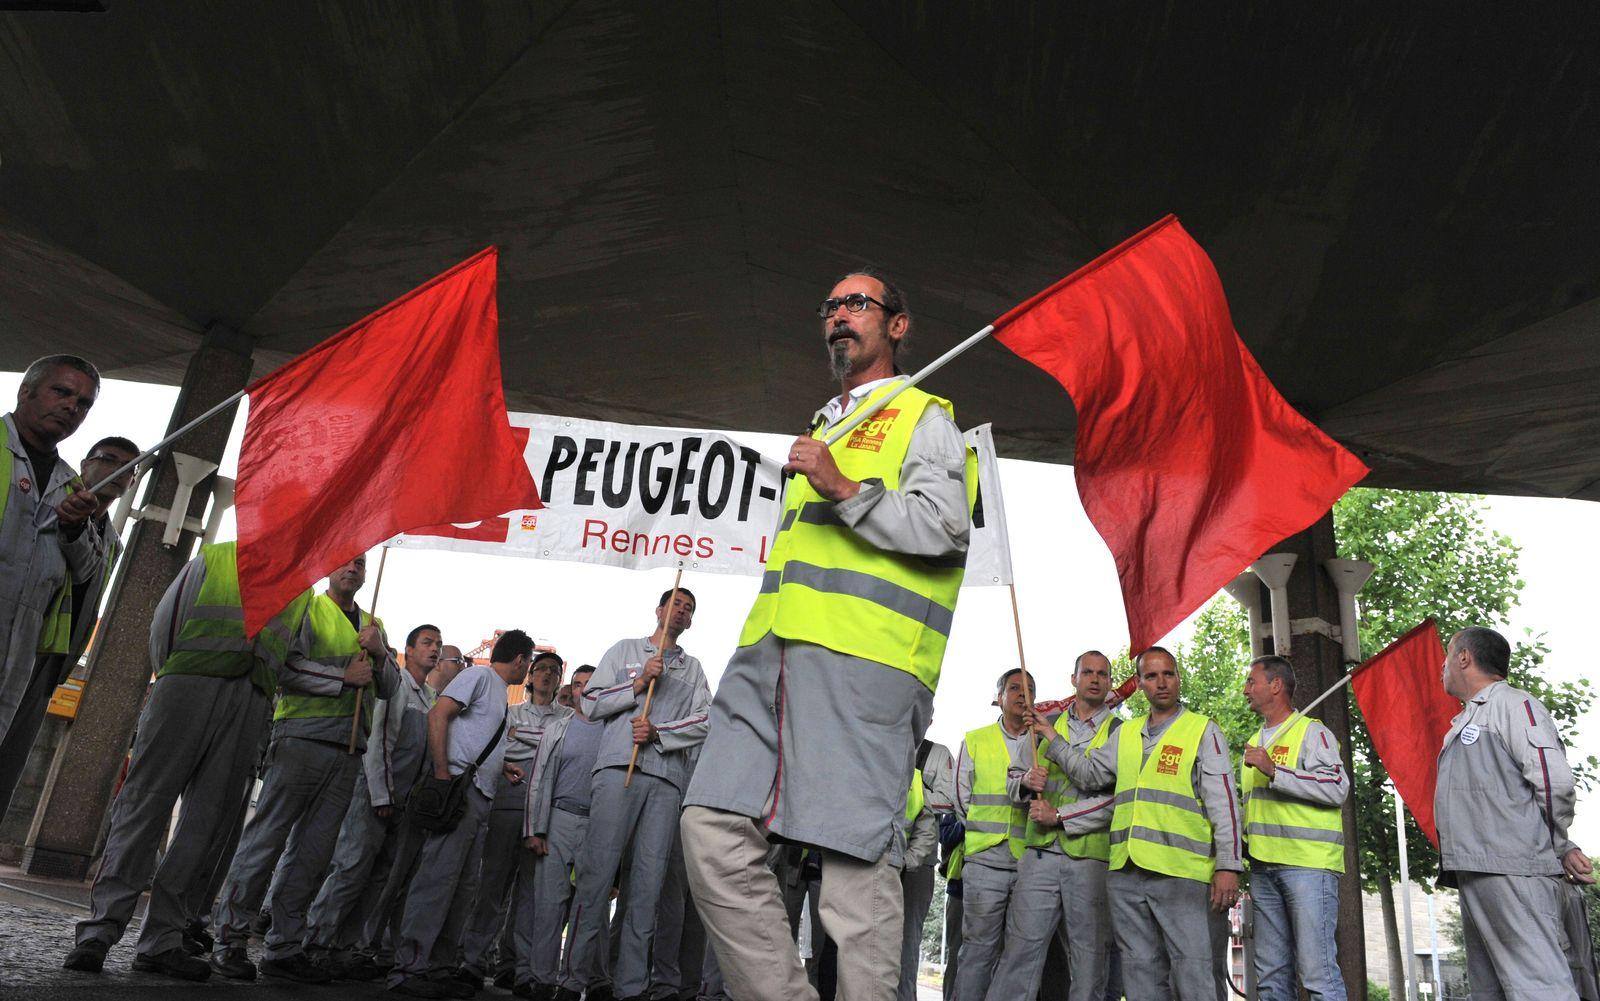 Peugeot Streik